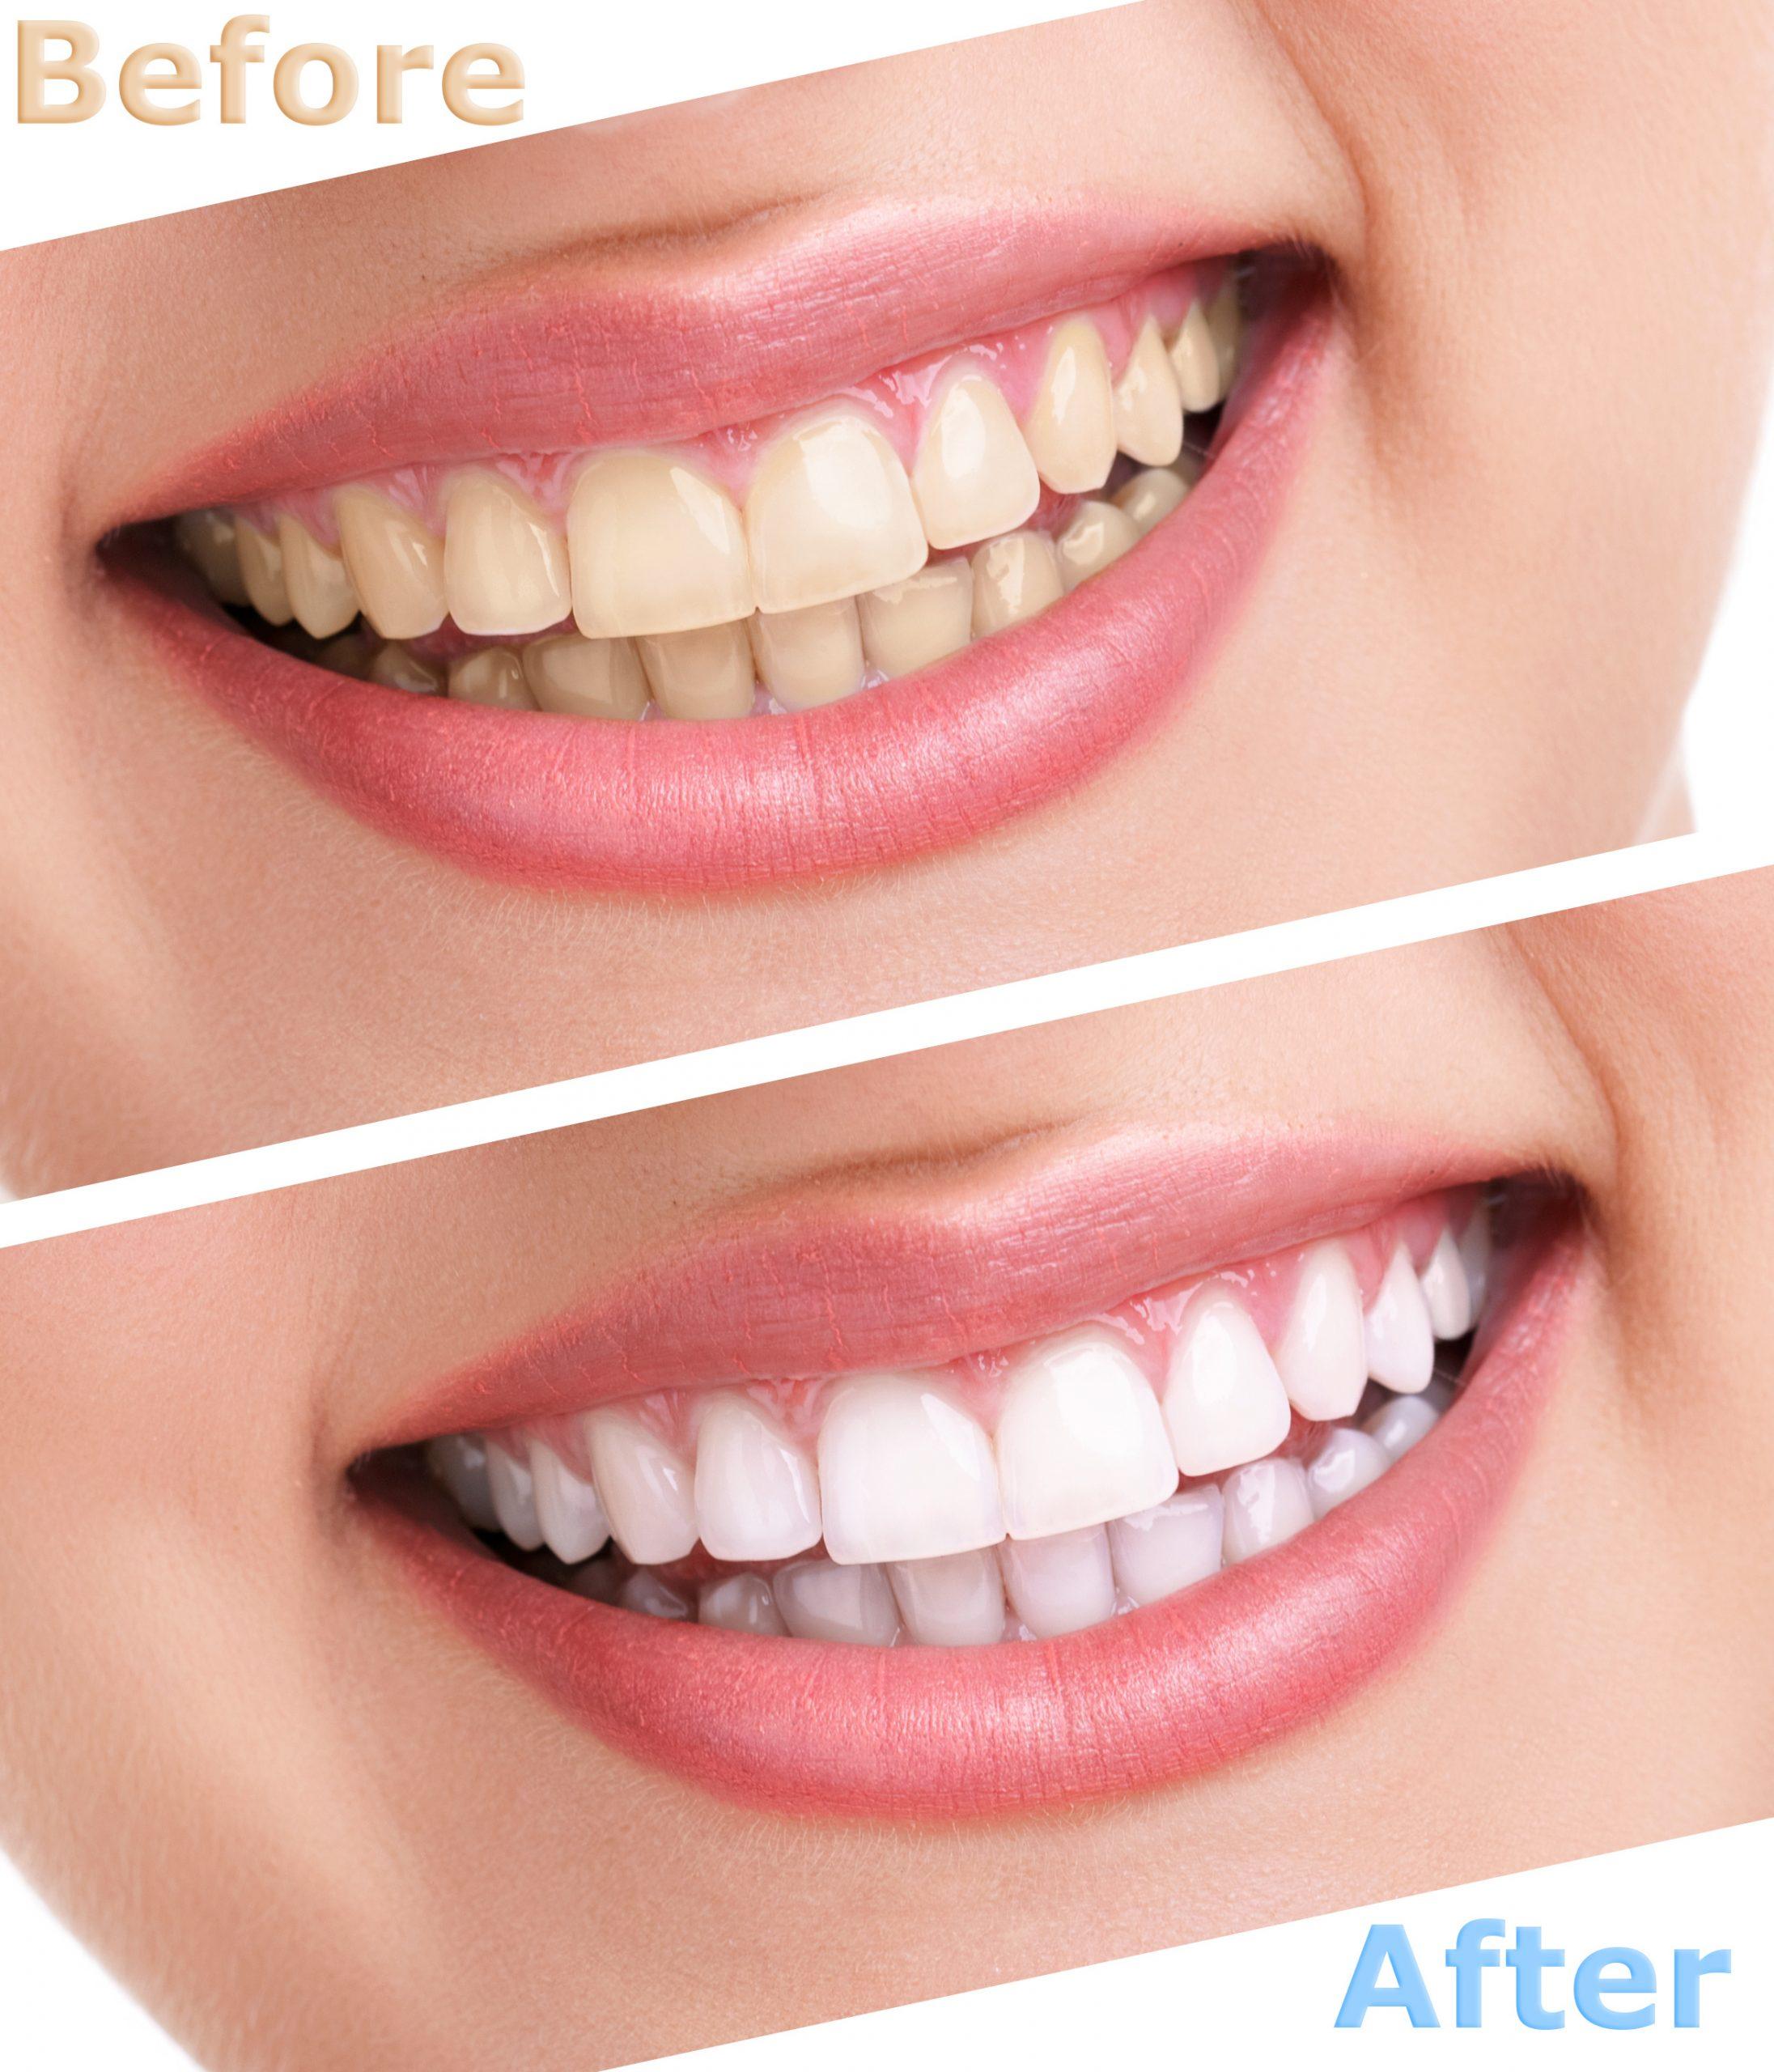 cleveland teeth whitening